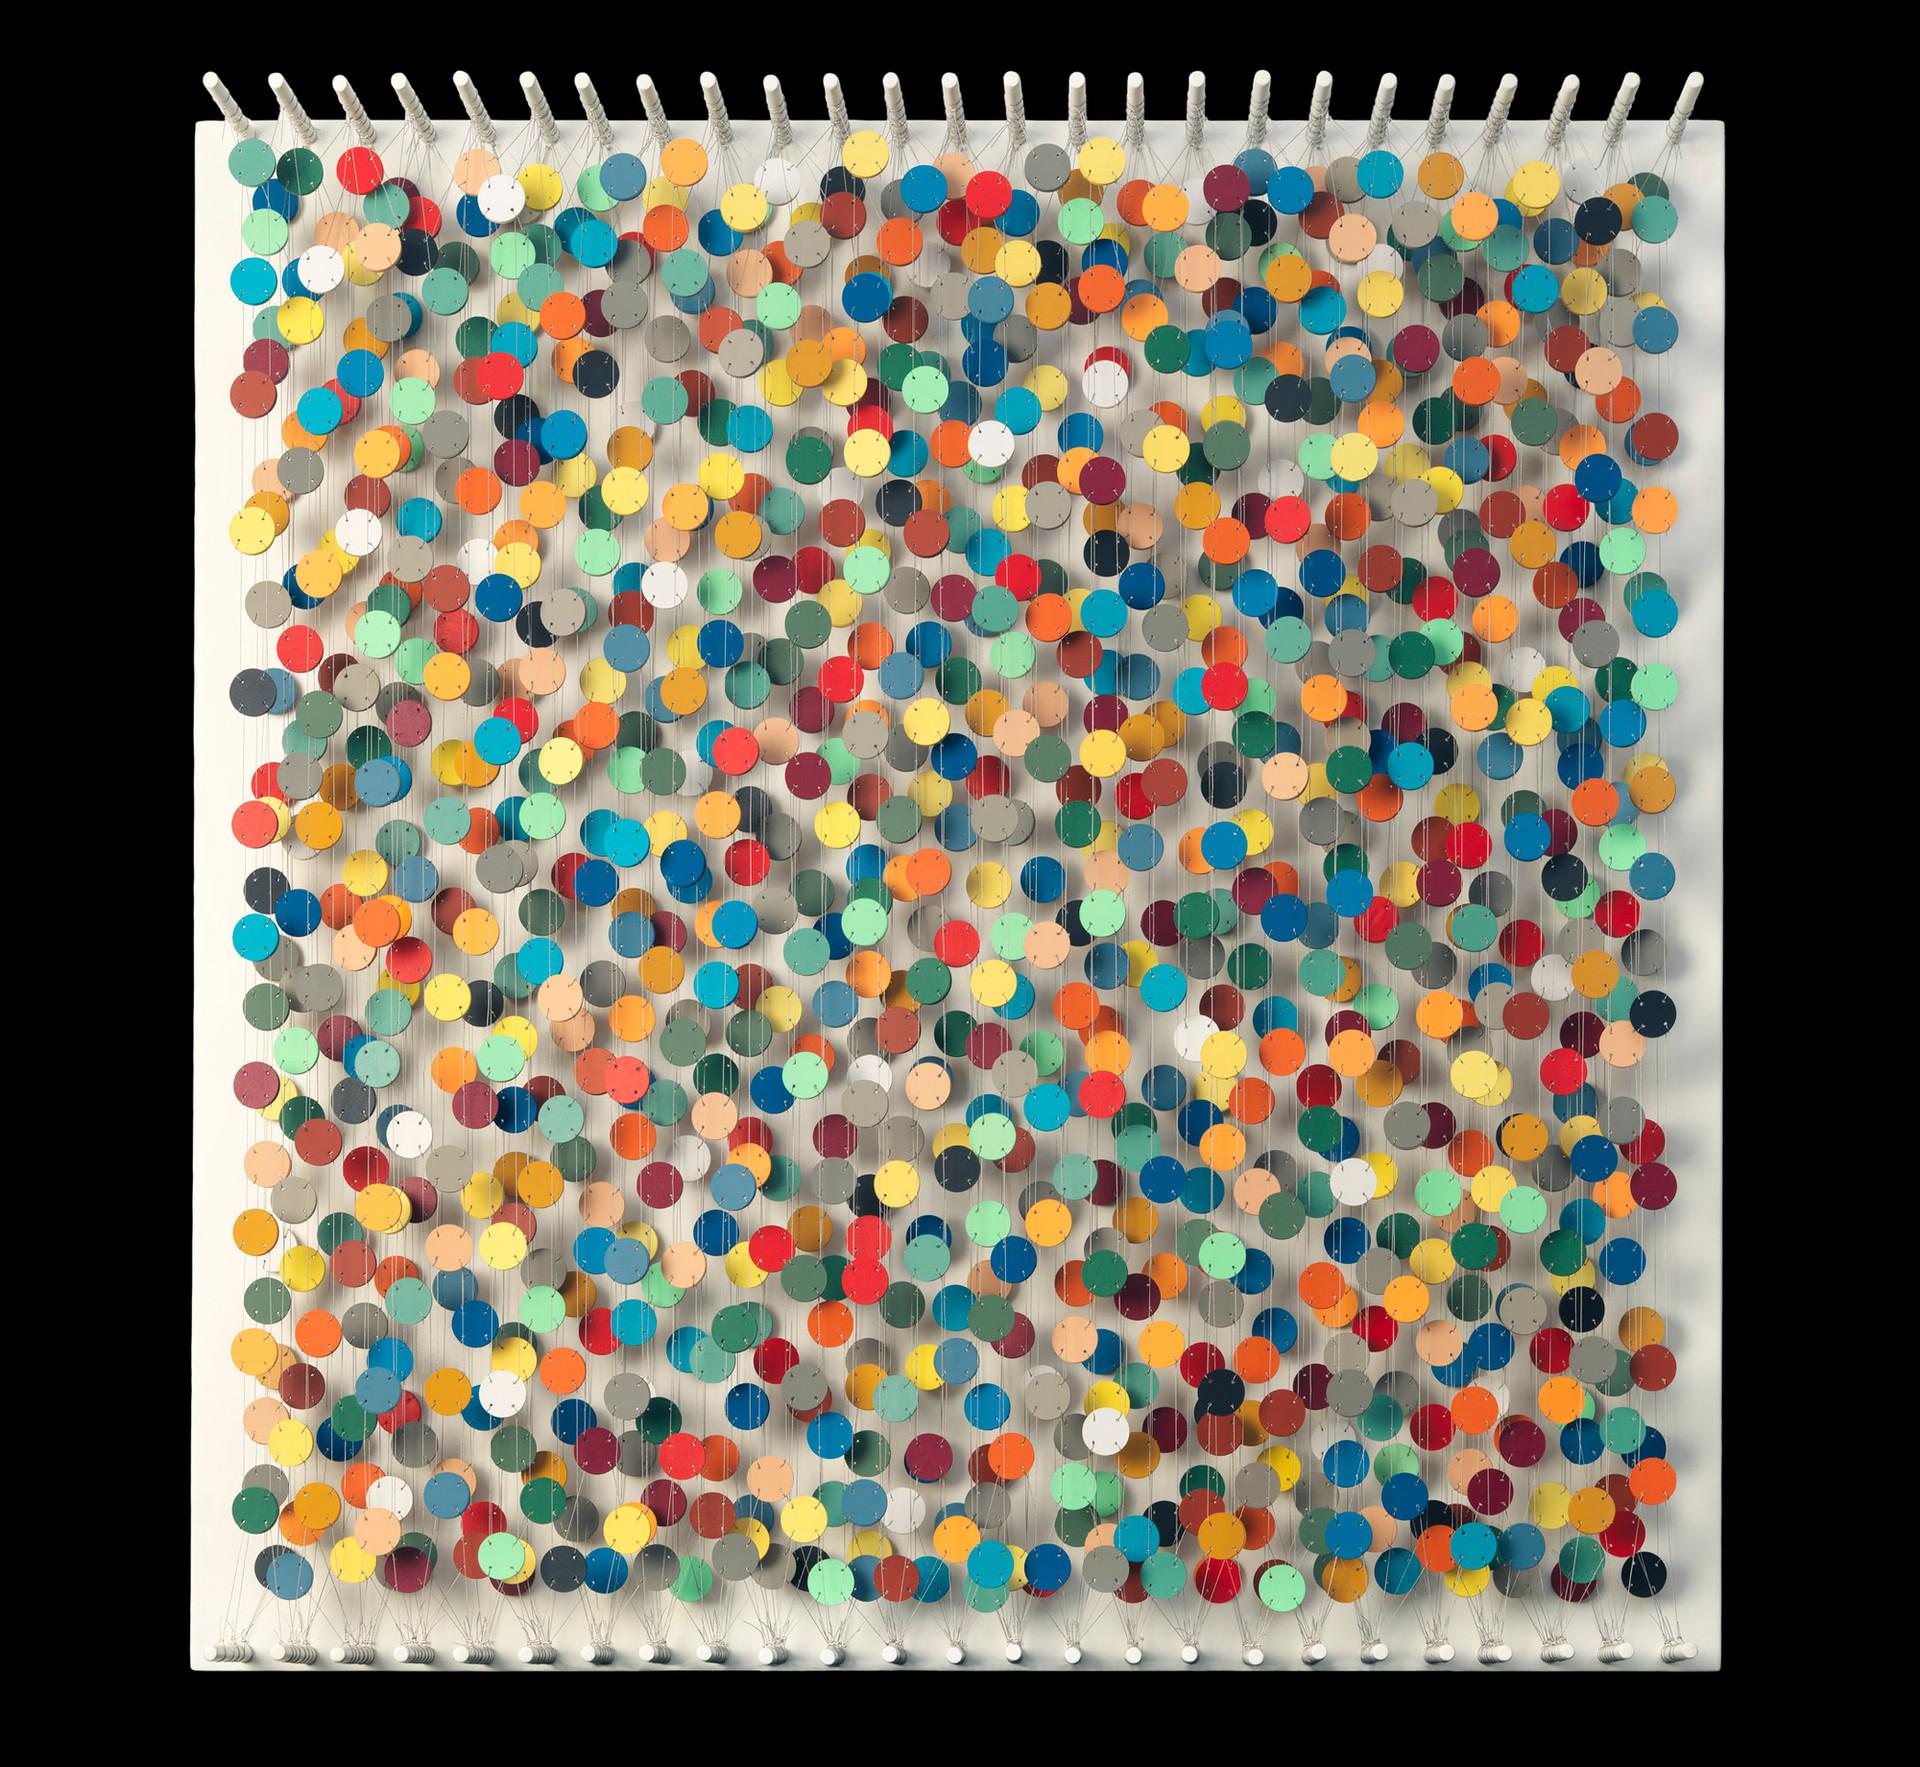 Cecilia Glazman Rainbow explosion 2017 Papel y madera pintado a mano e hilo (Hand painted paper and wood, thread) 100 x 100 cm.